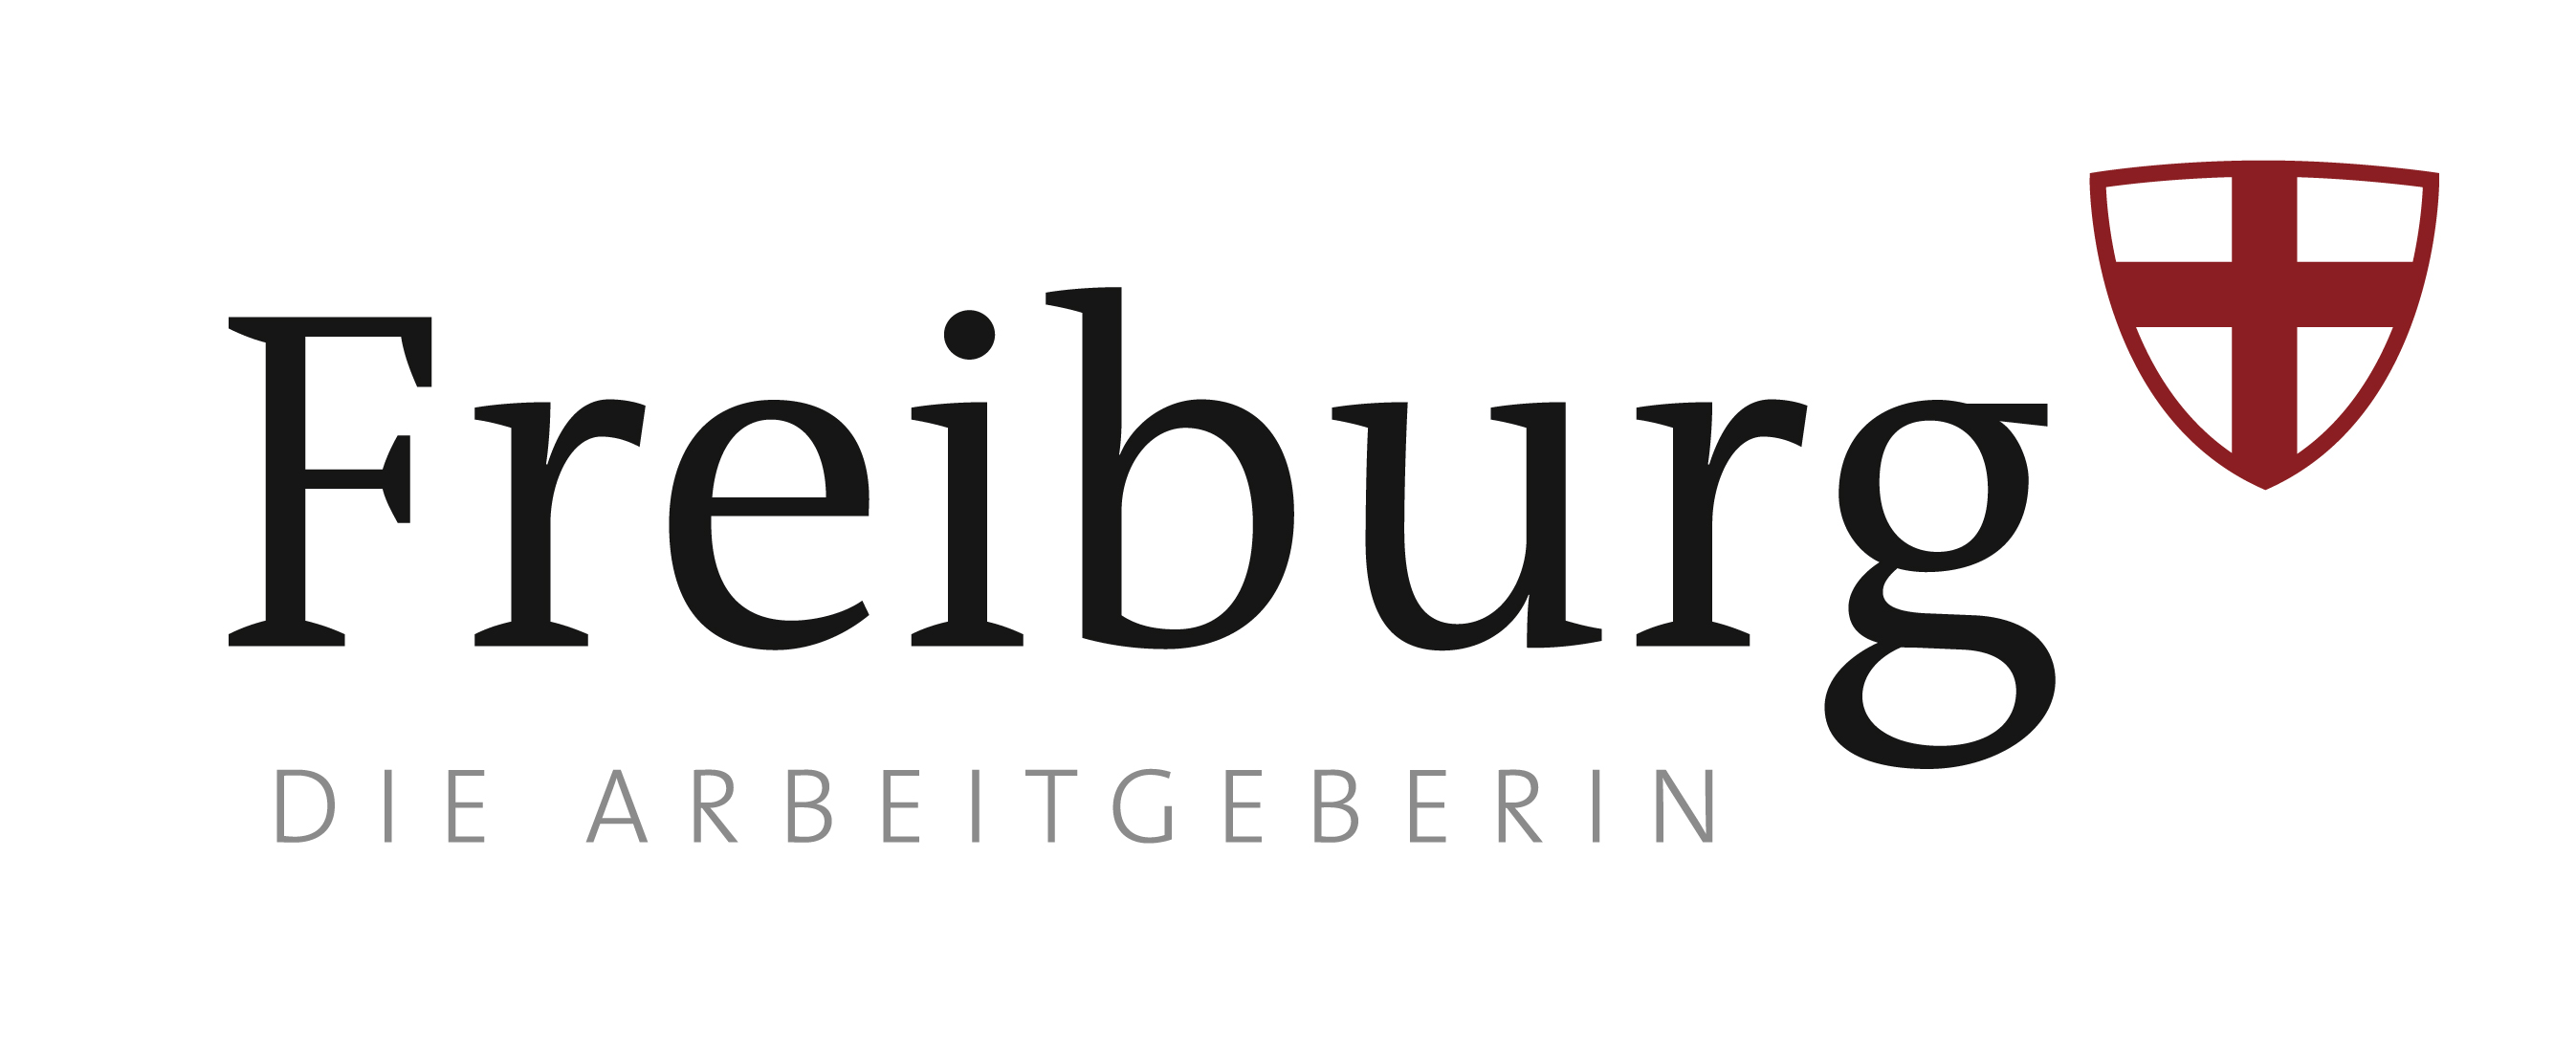 Freiburg-Arbeitgeberin Logo